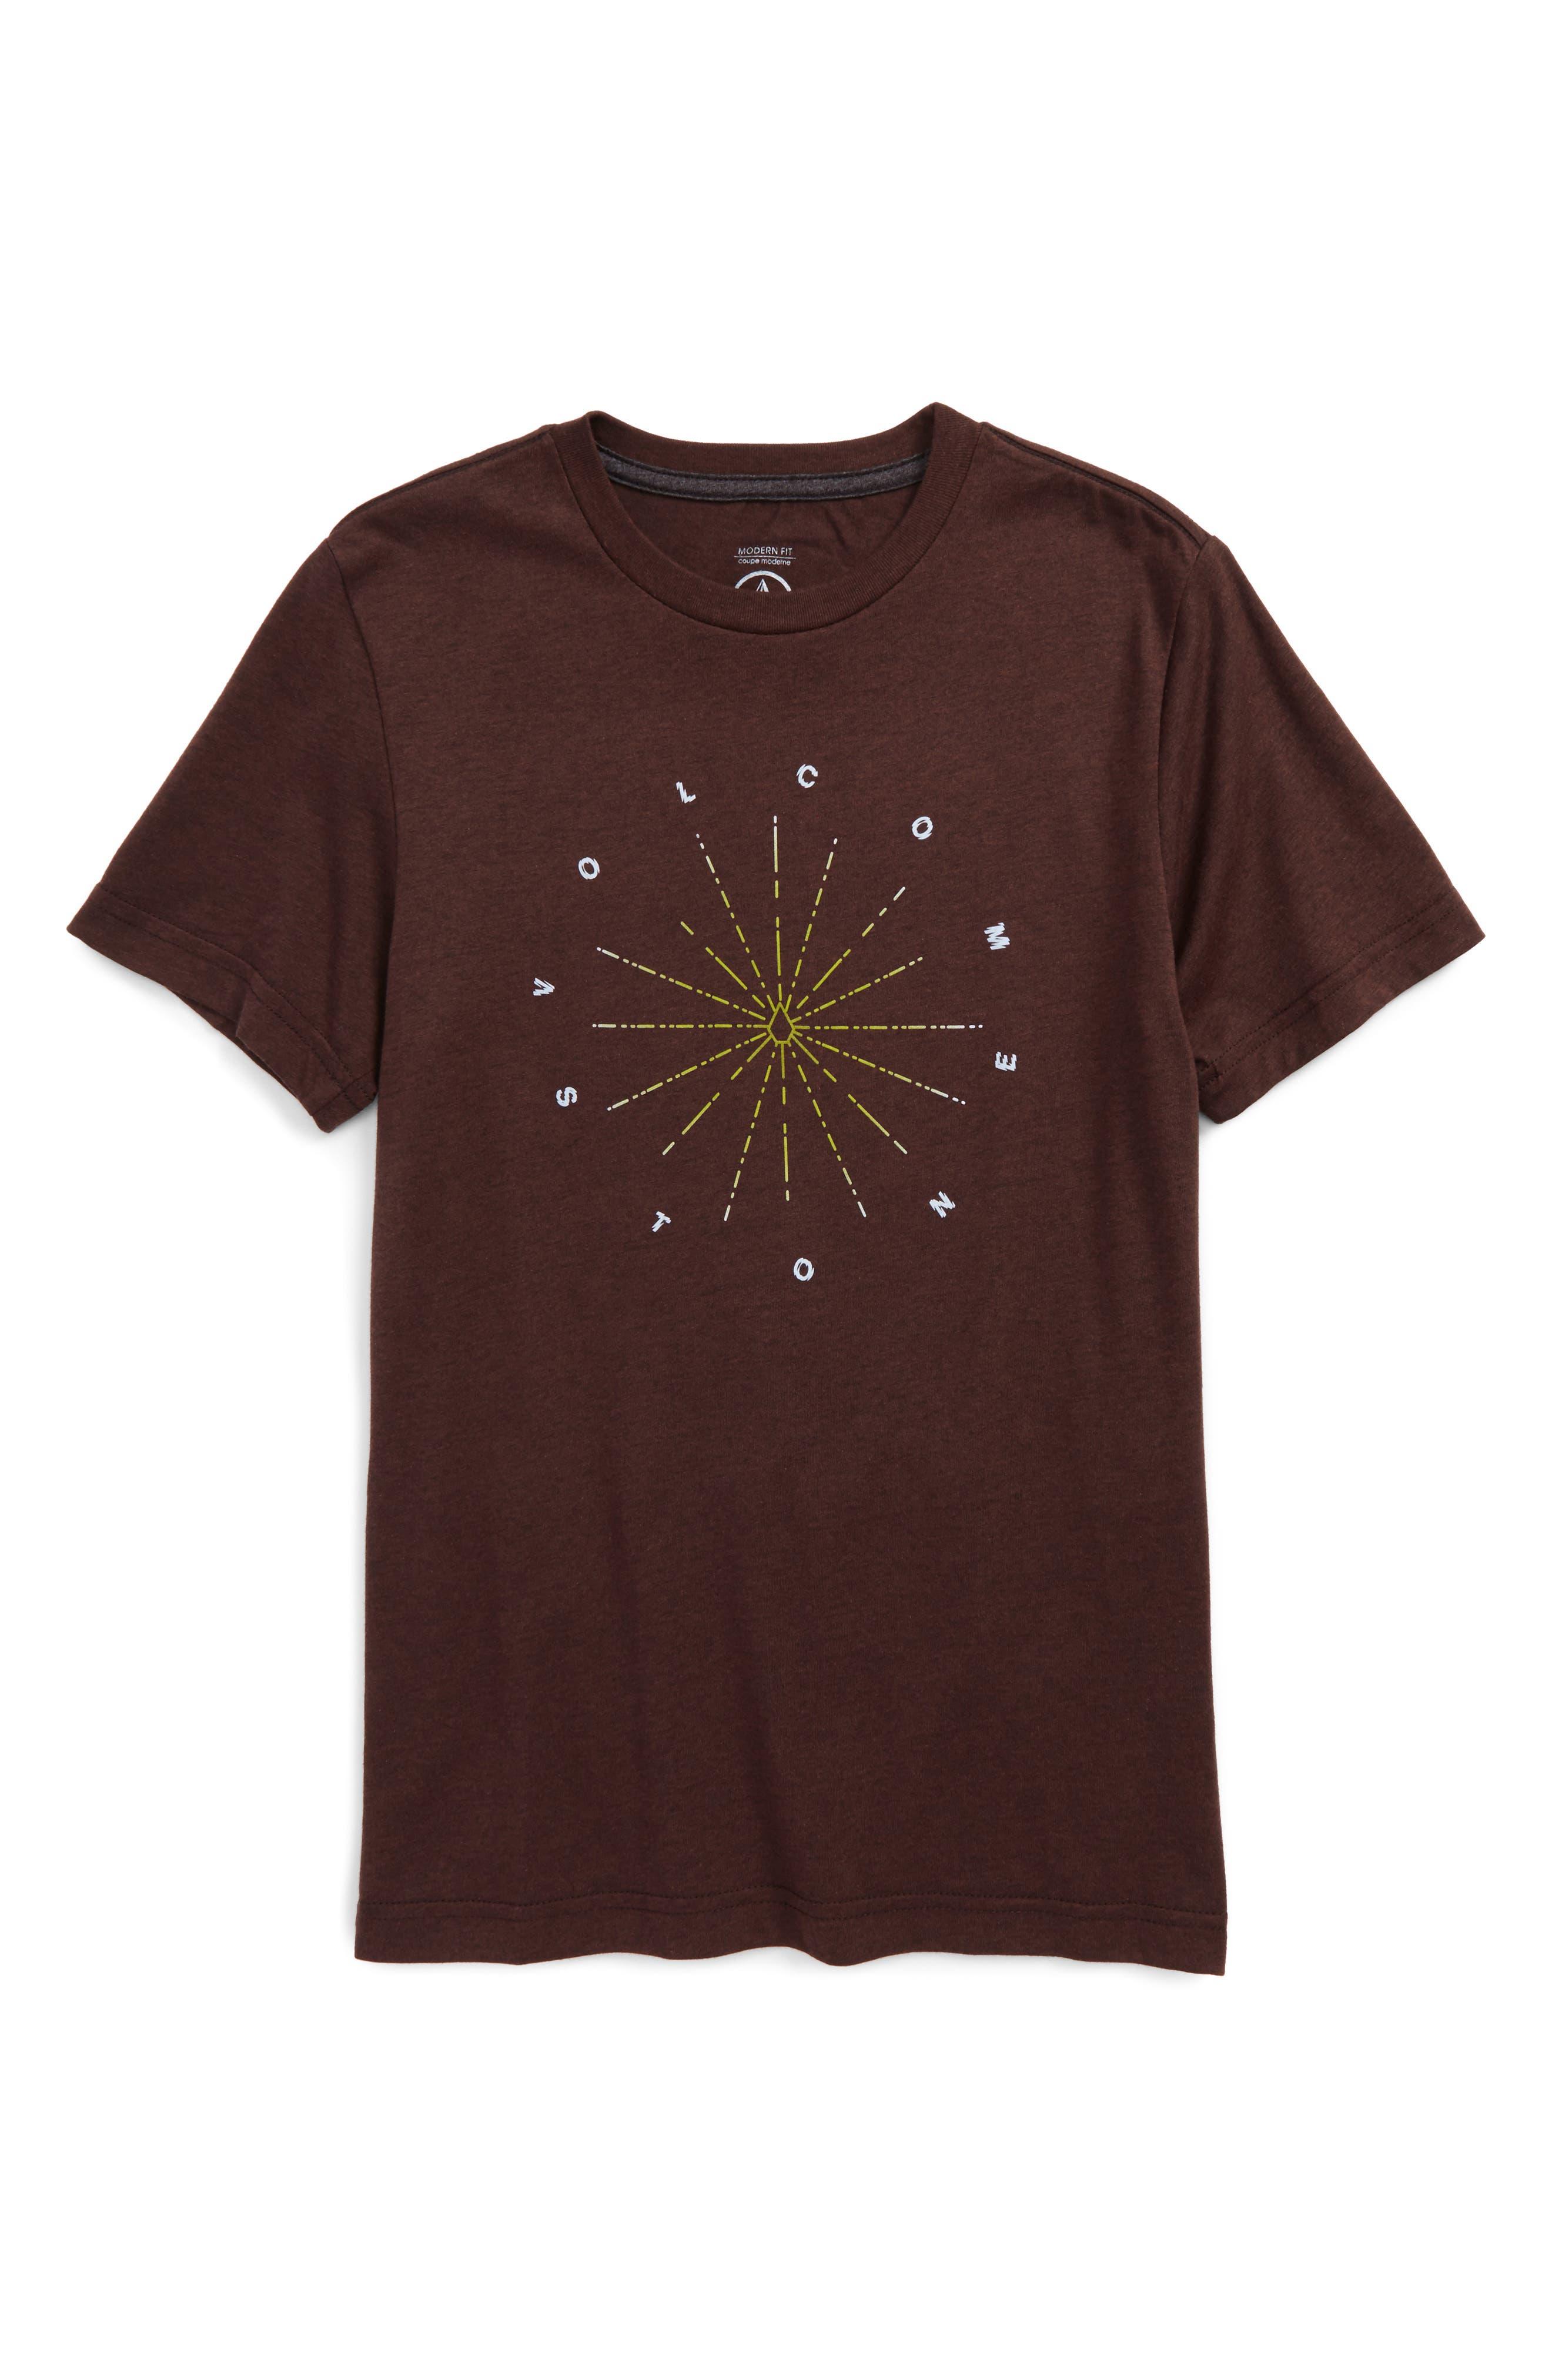 Main Image - Volcom Burst Graphic T-Shirt (Big Boys)